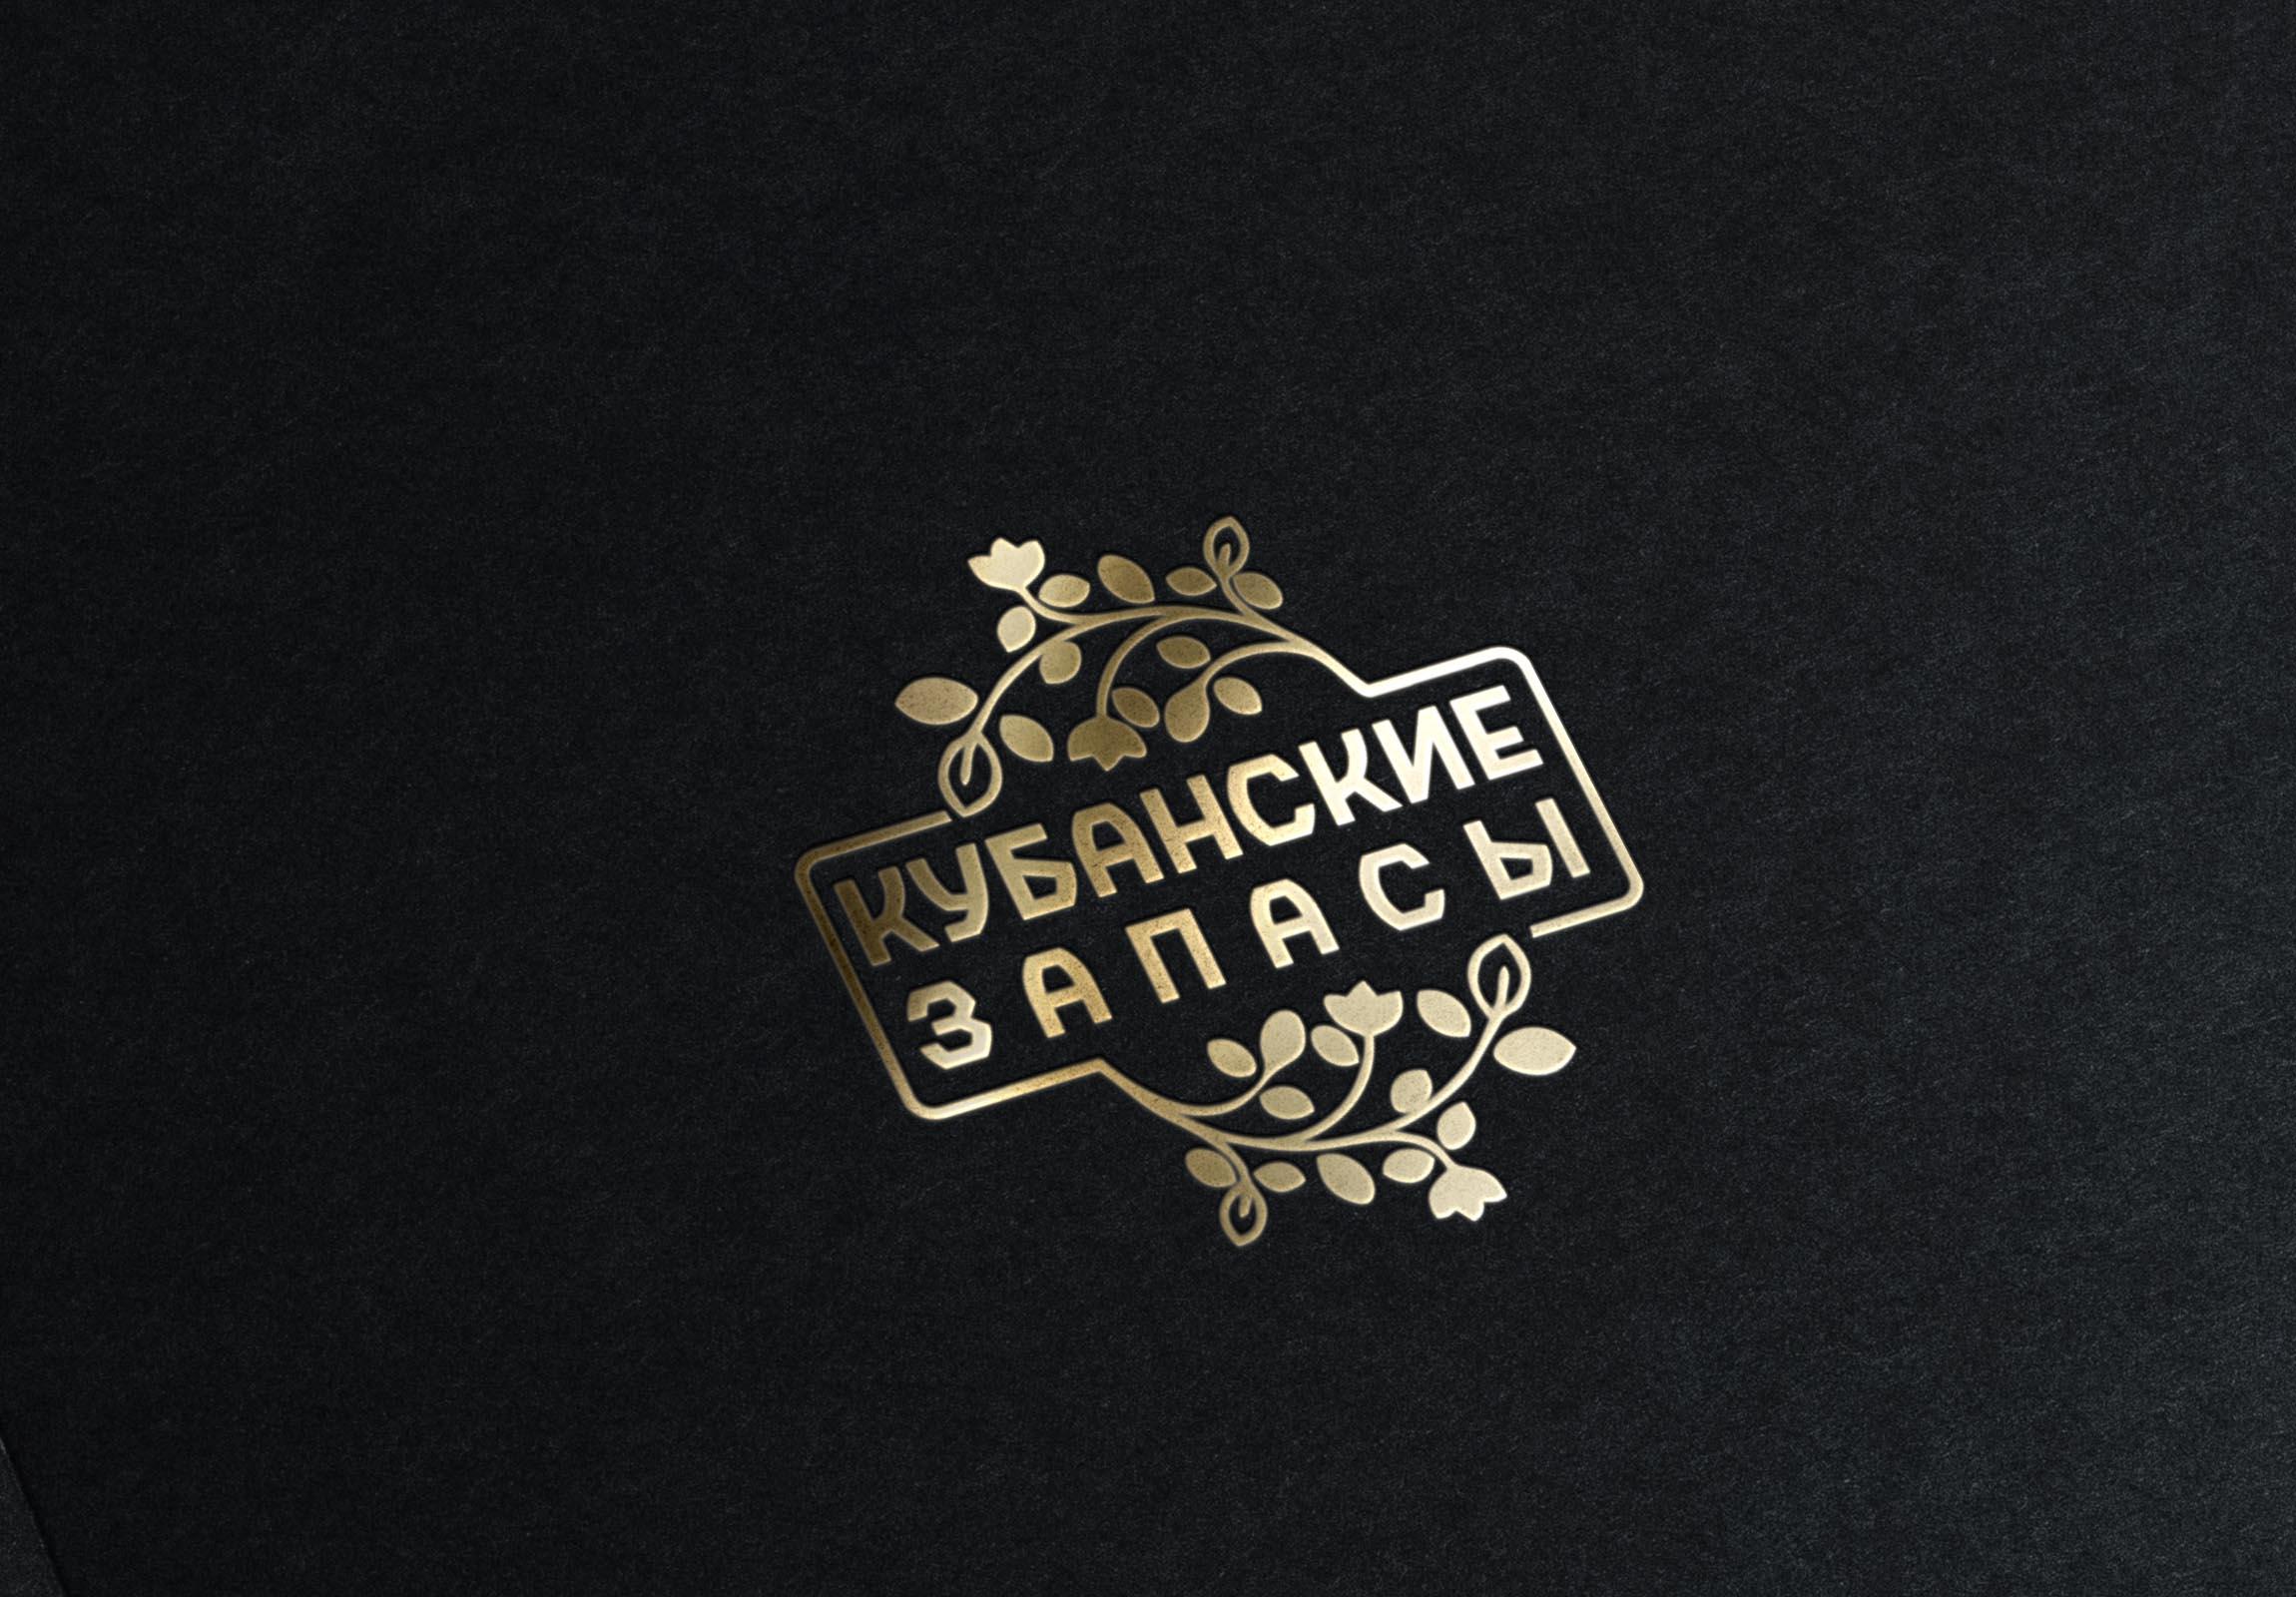 Логотип, фирменный стиль фото f_6865de61d6f745f8.jpg